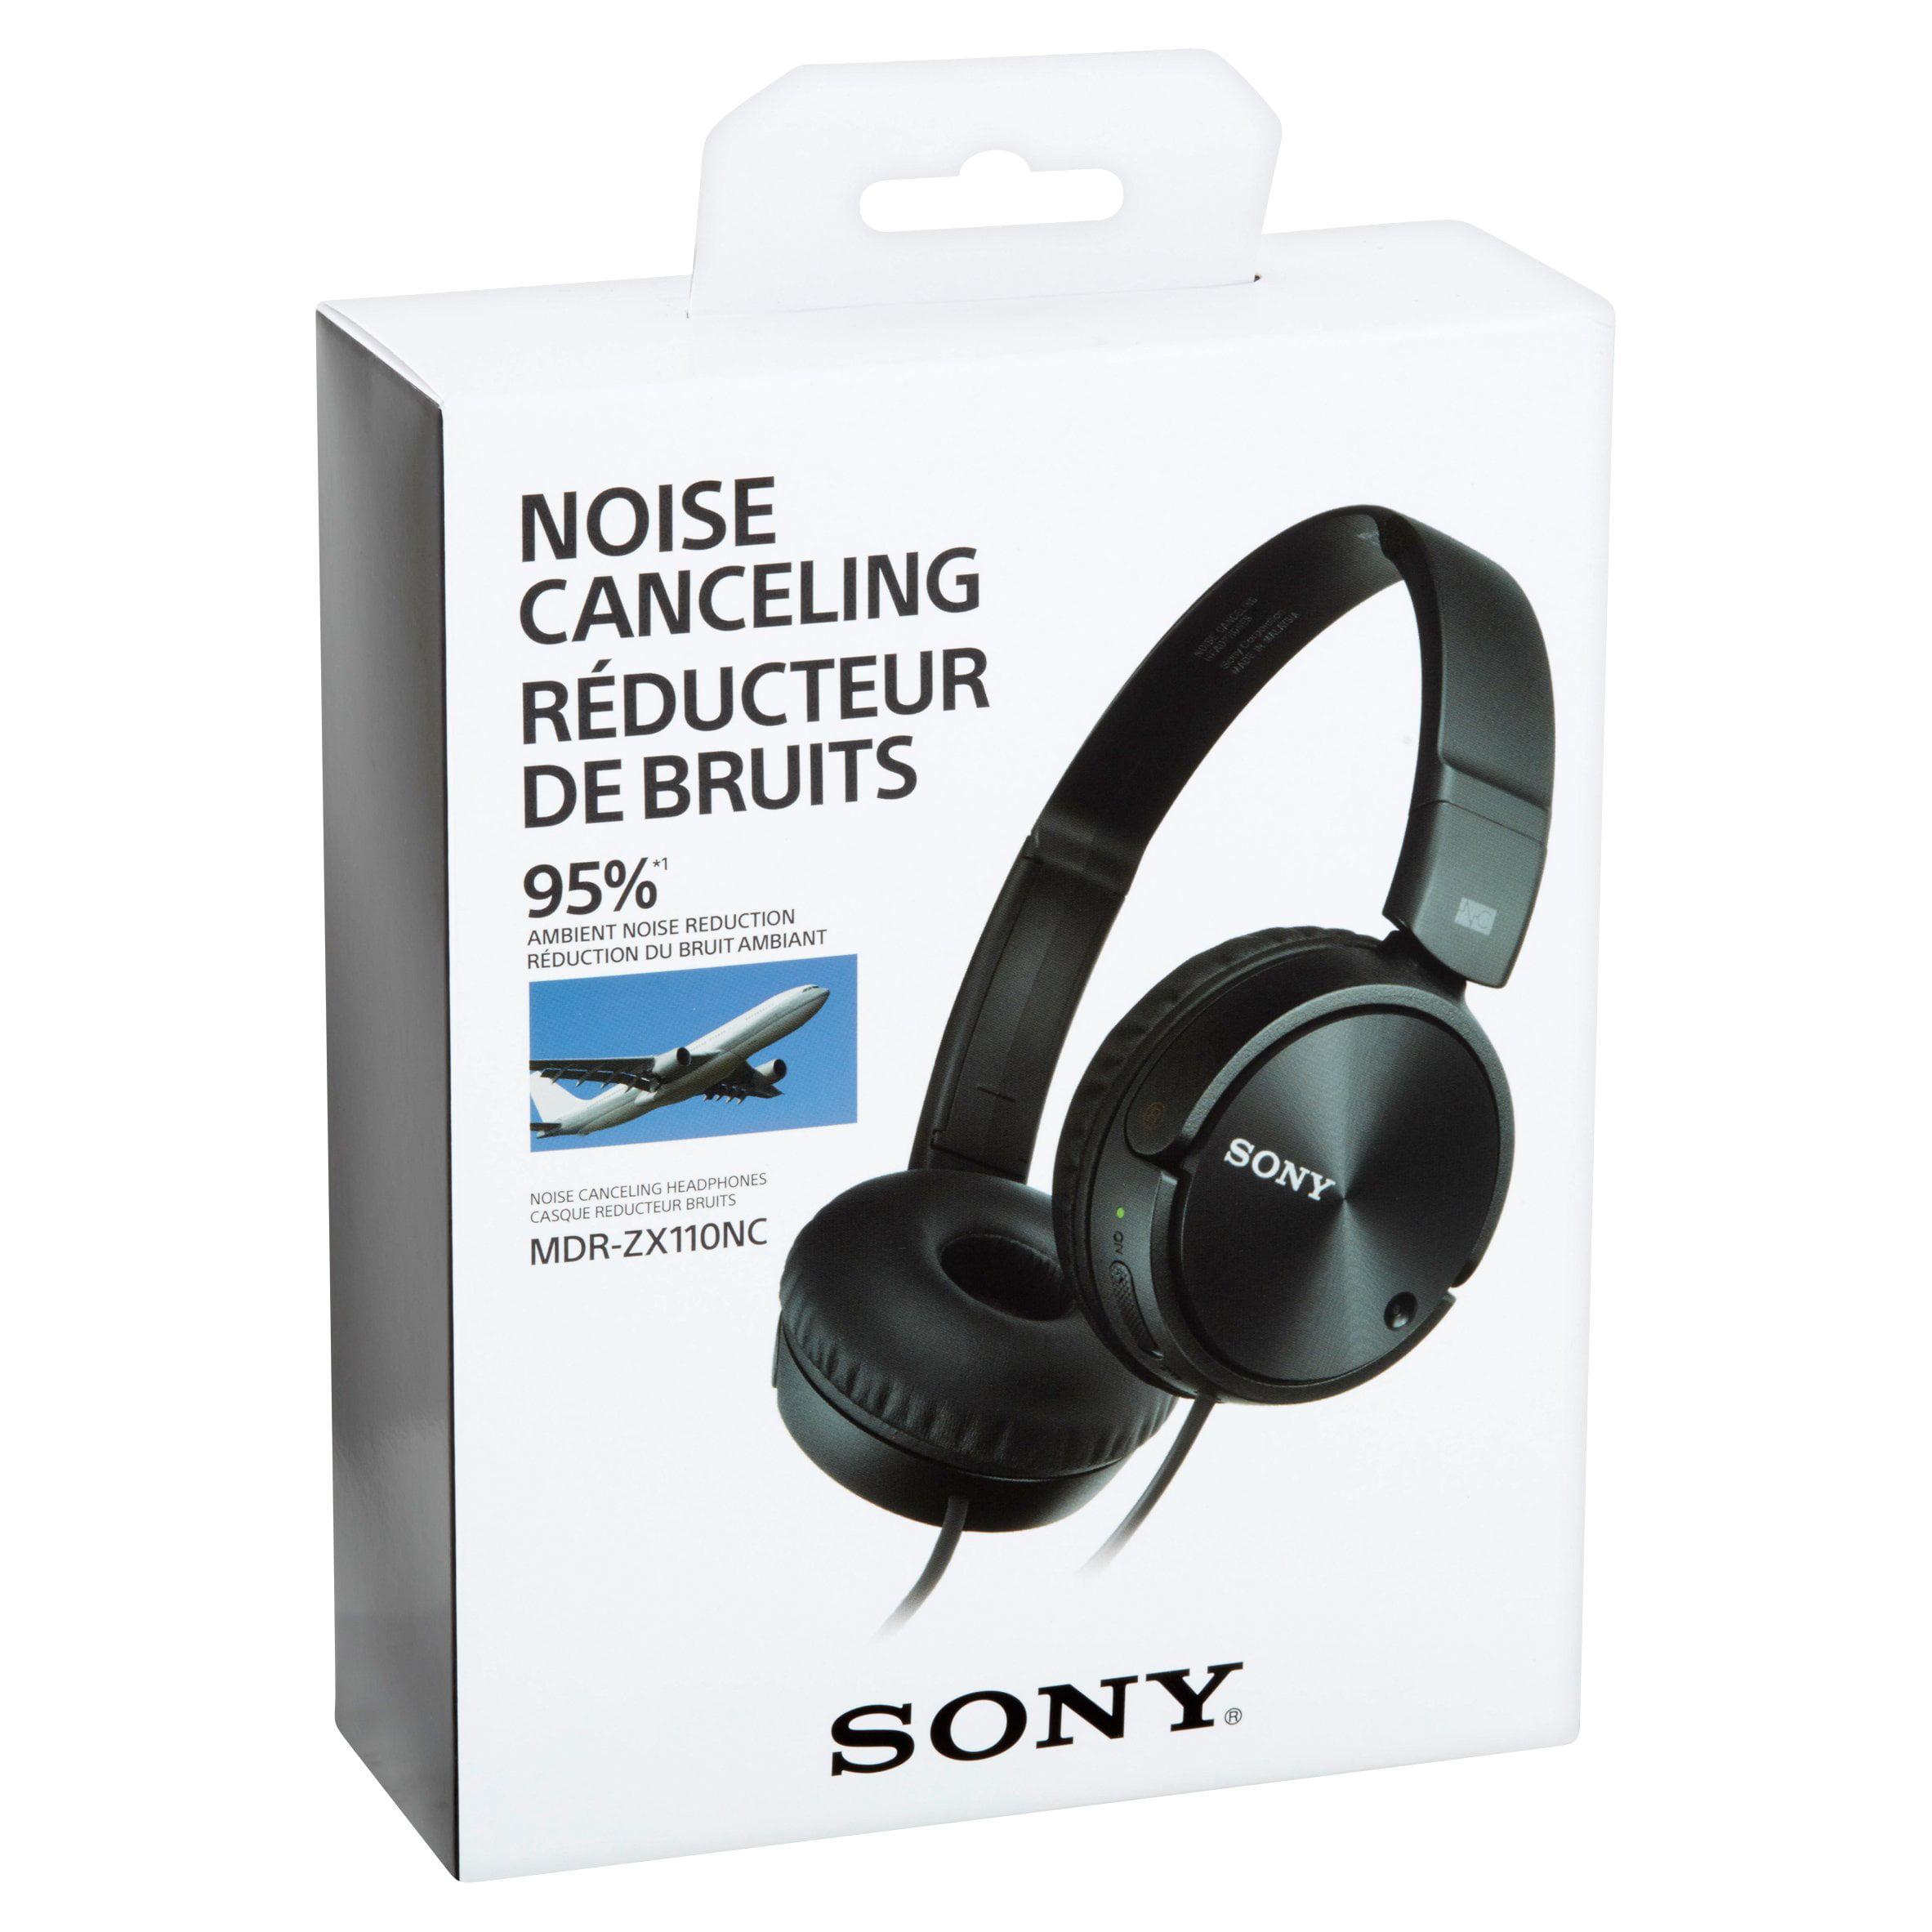 43f3f20b435 Sony MDR-ZX110NC Noise-Canceling Headphones - Walmart.com